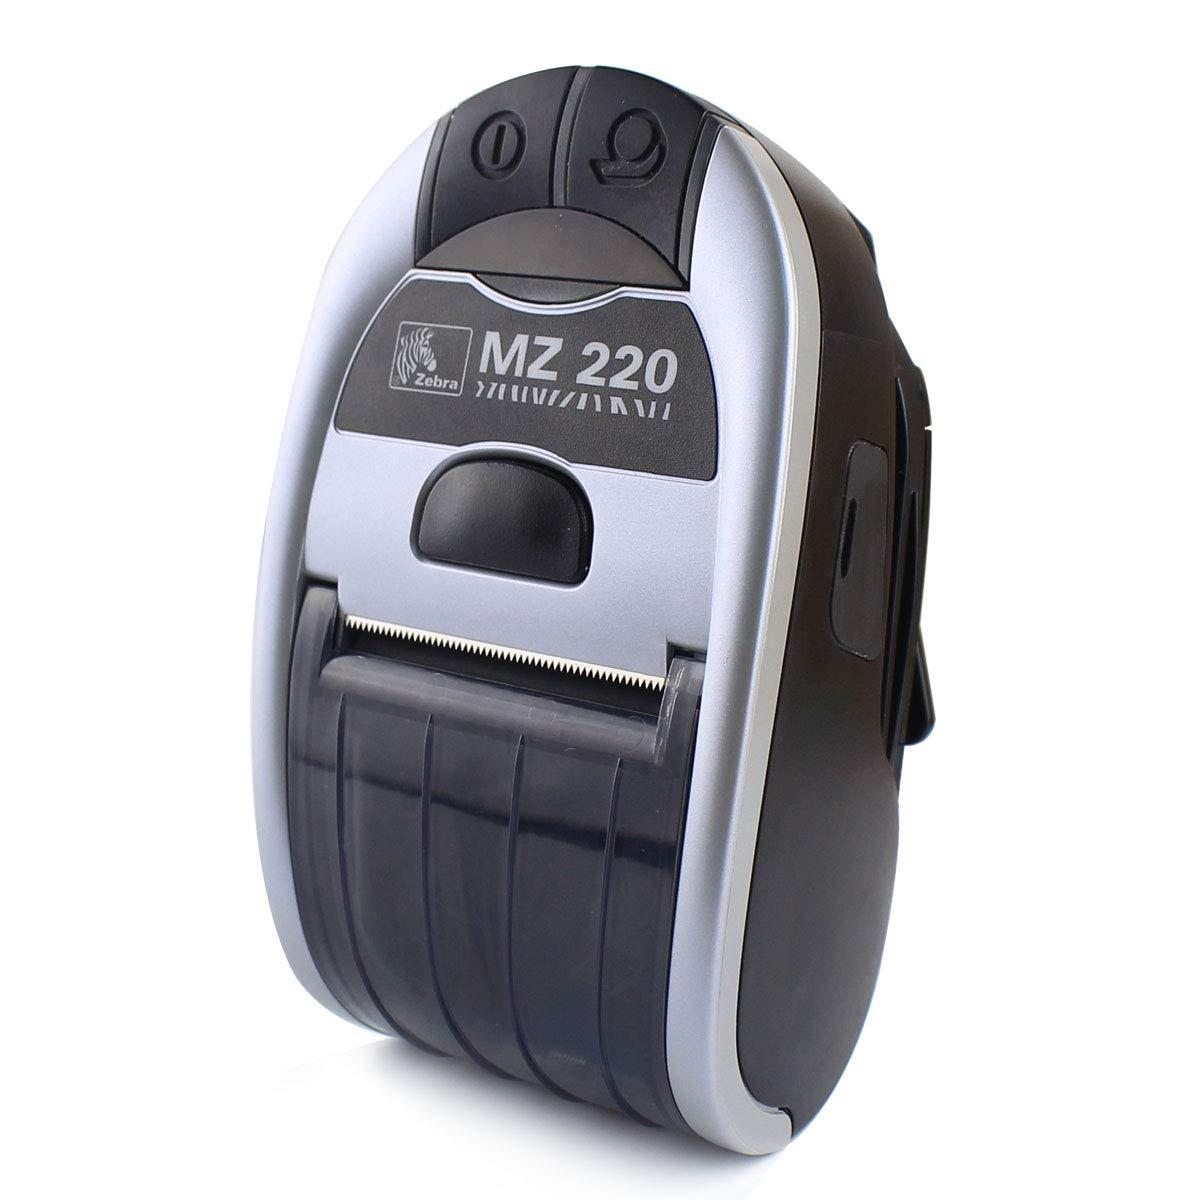 Zebra MZ 220 Mobile Bluetooth Receipt Printer MZ 220 Thermal Wireless Printer Direct Portable Printer M2E-0UB0E020-00 ZUYE